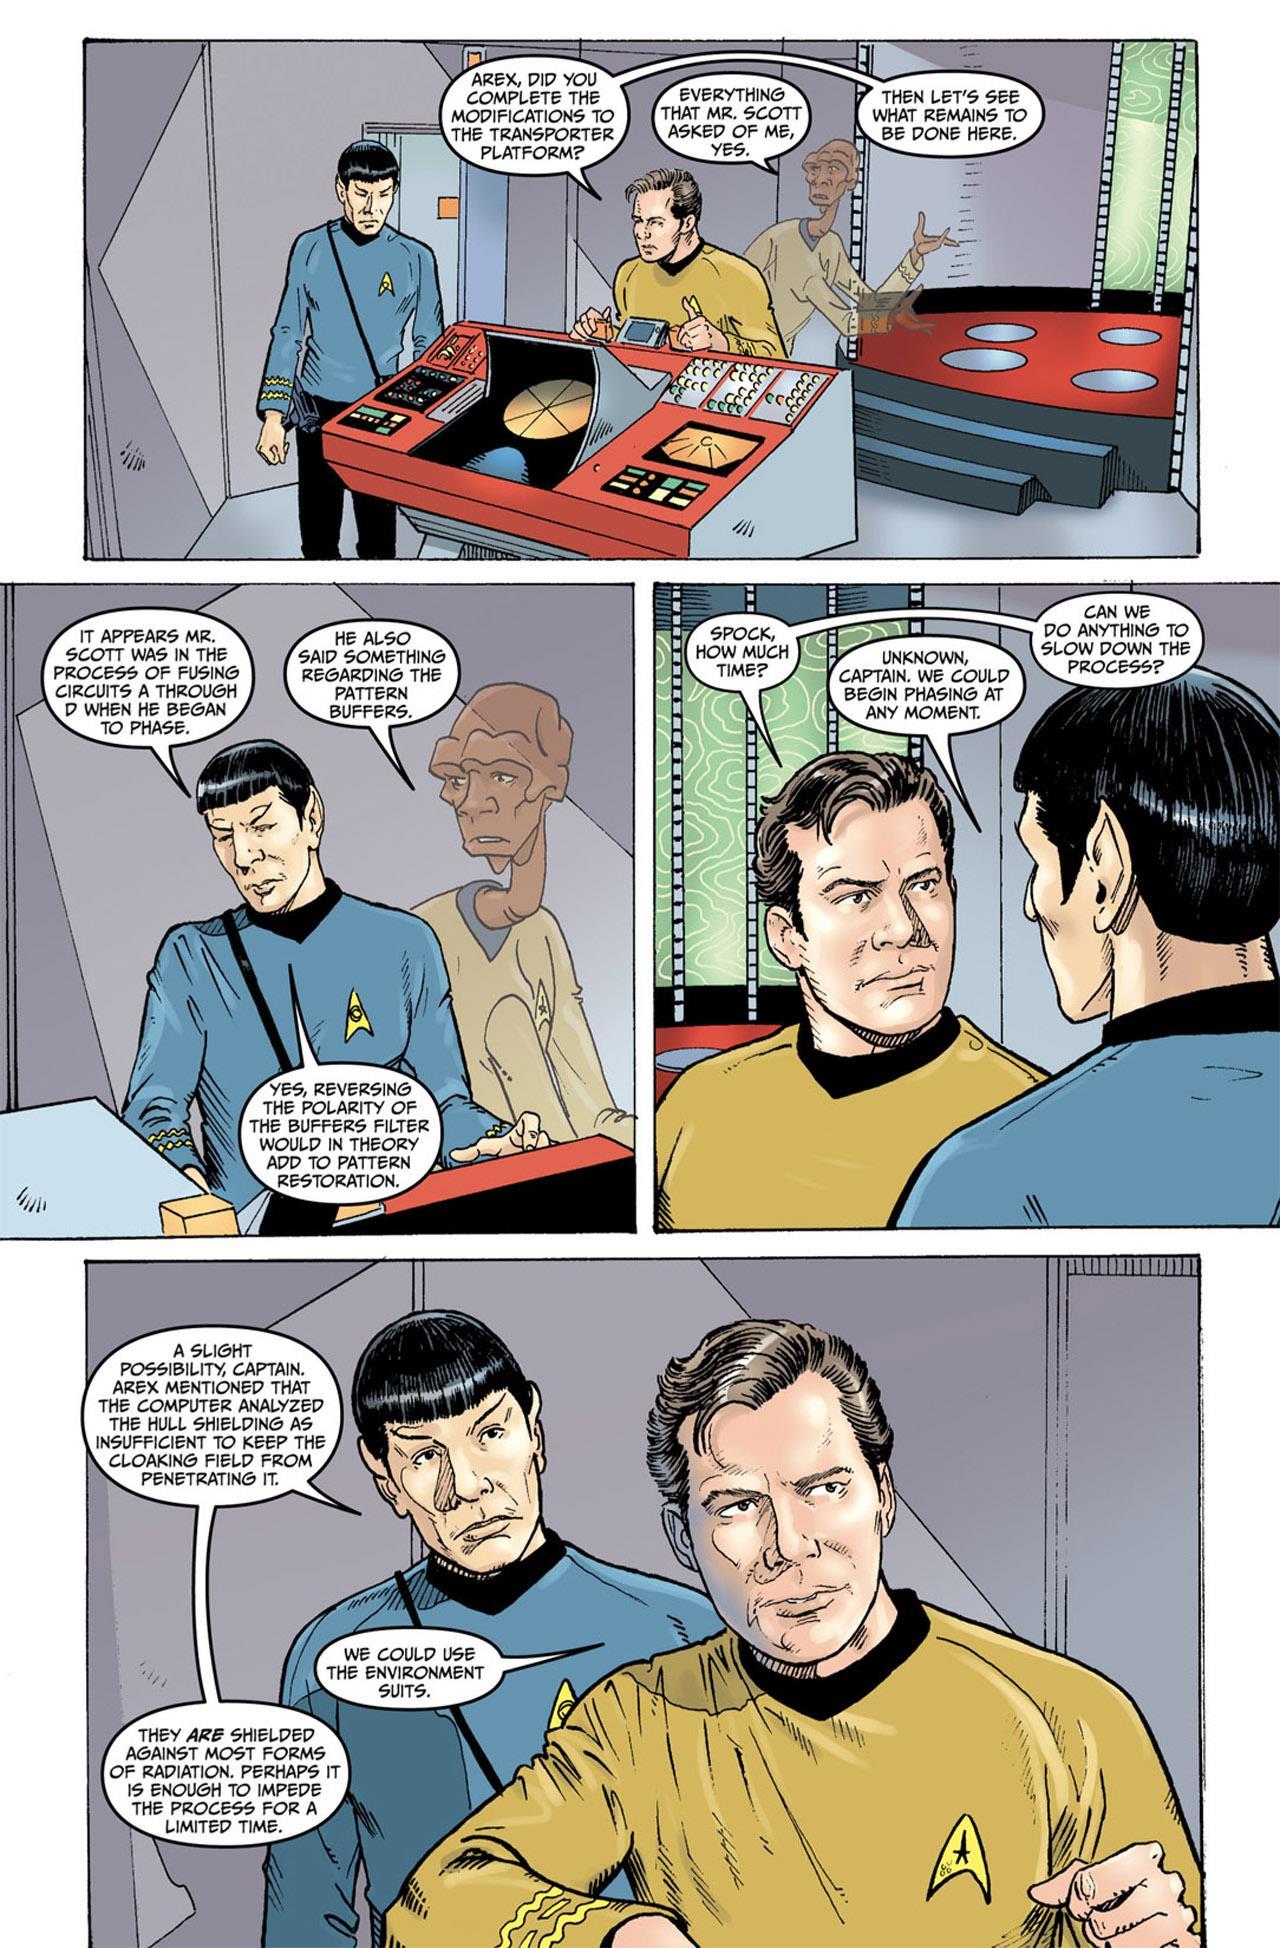 Star Trek Year Four - Enterprise Experiment review